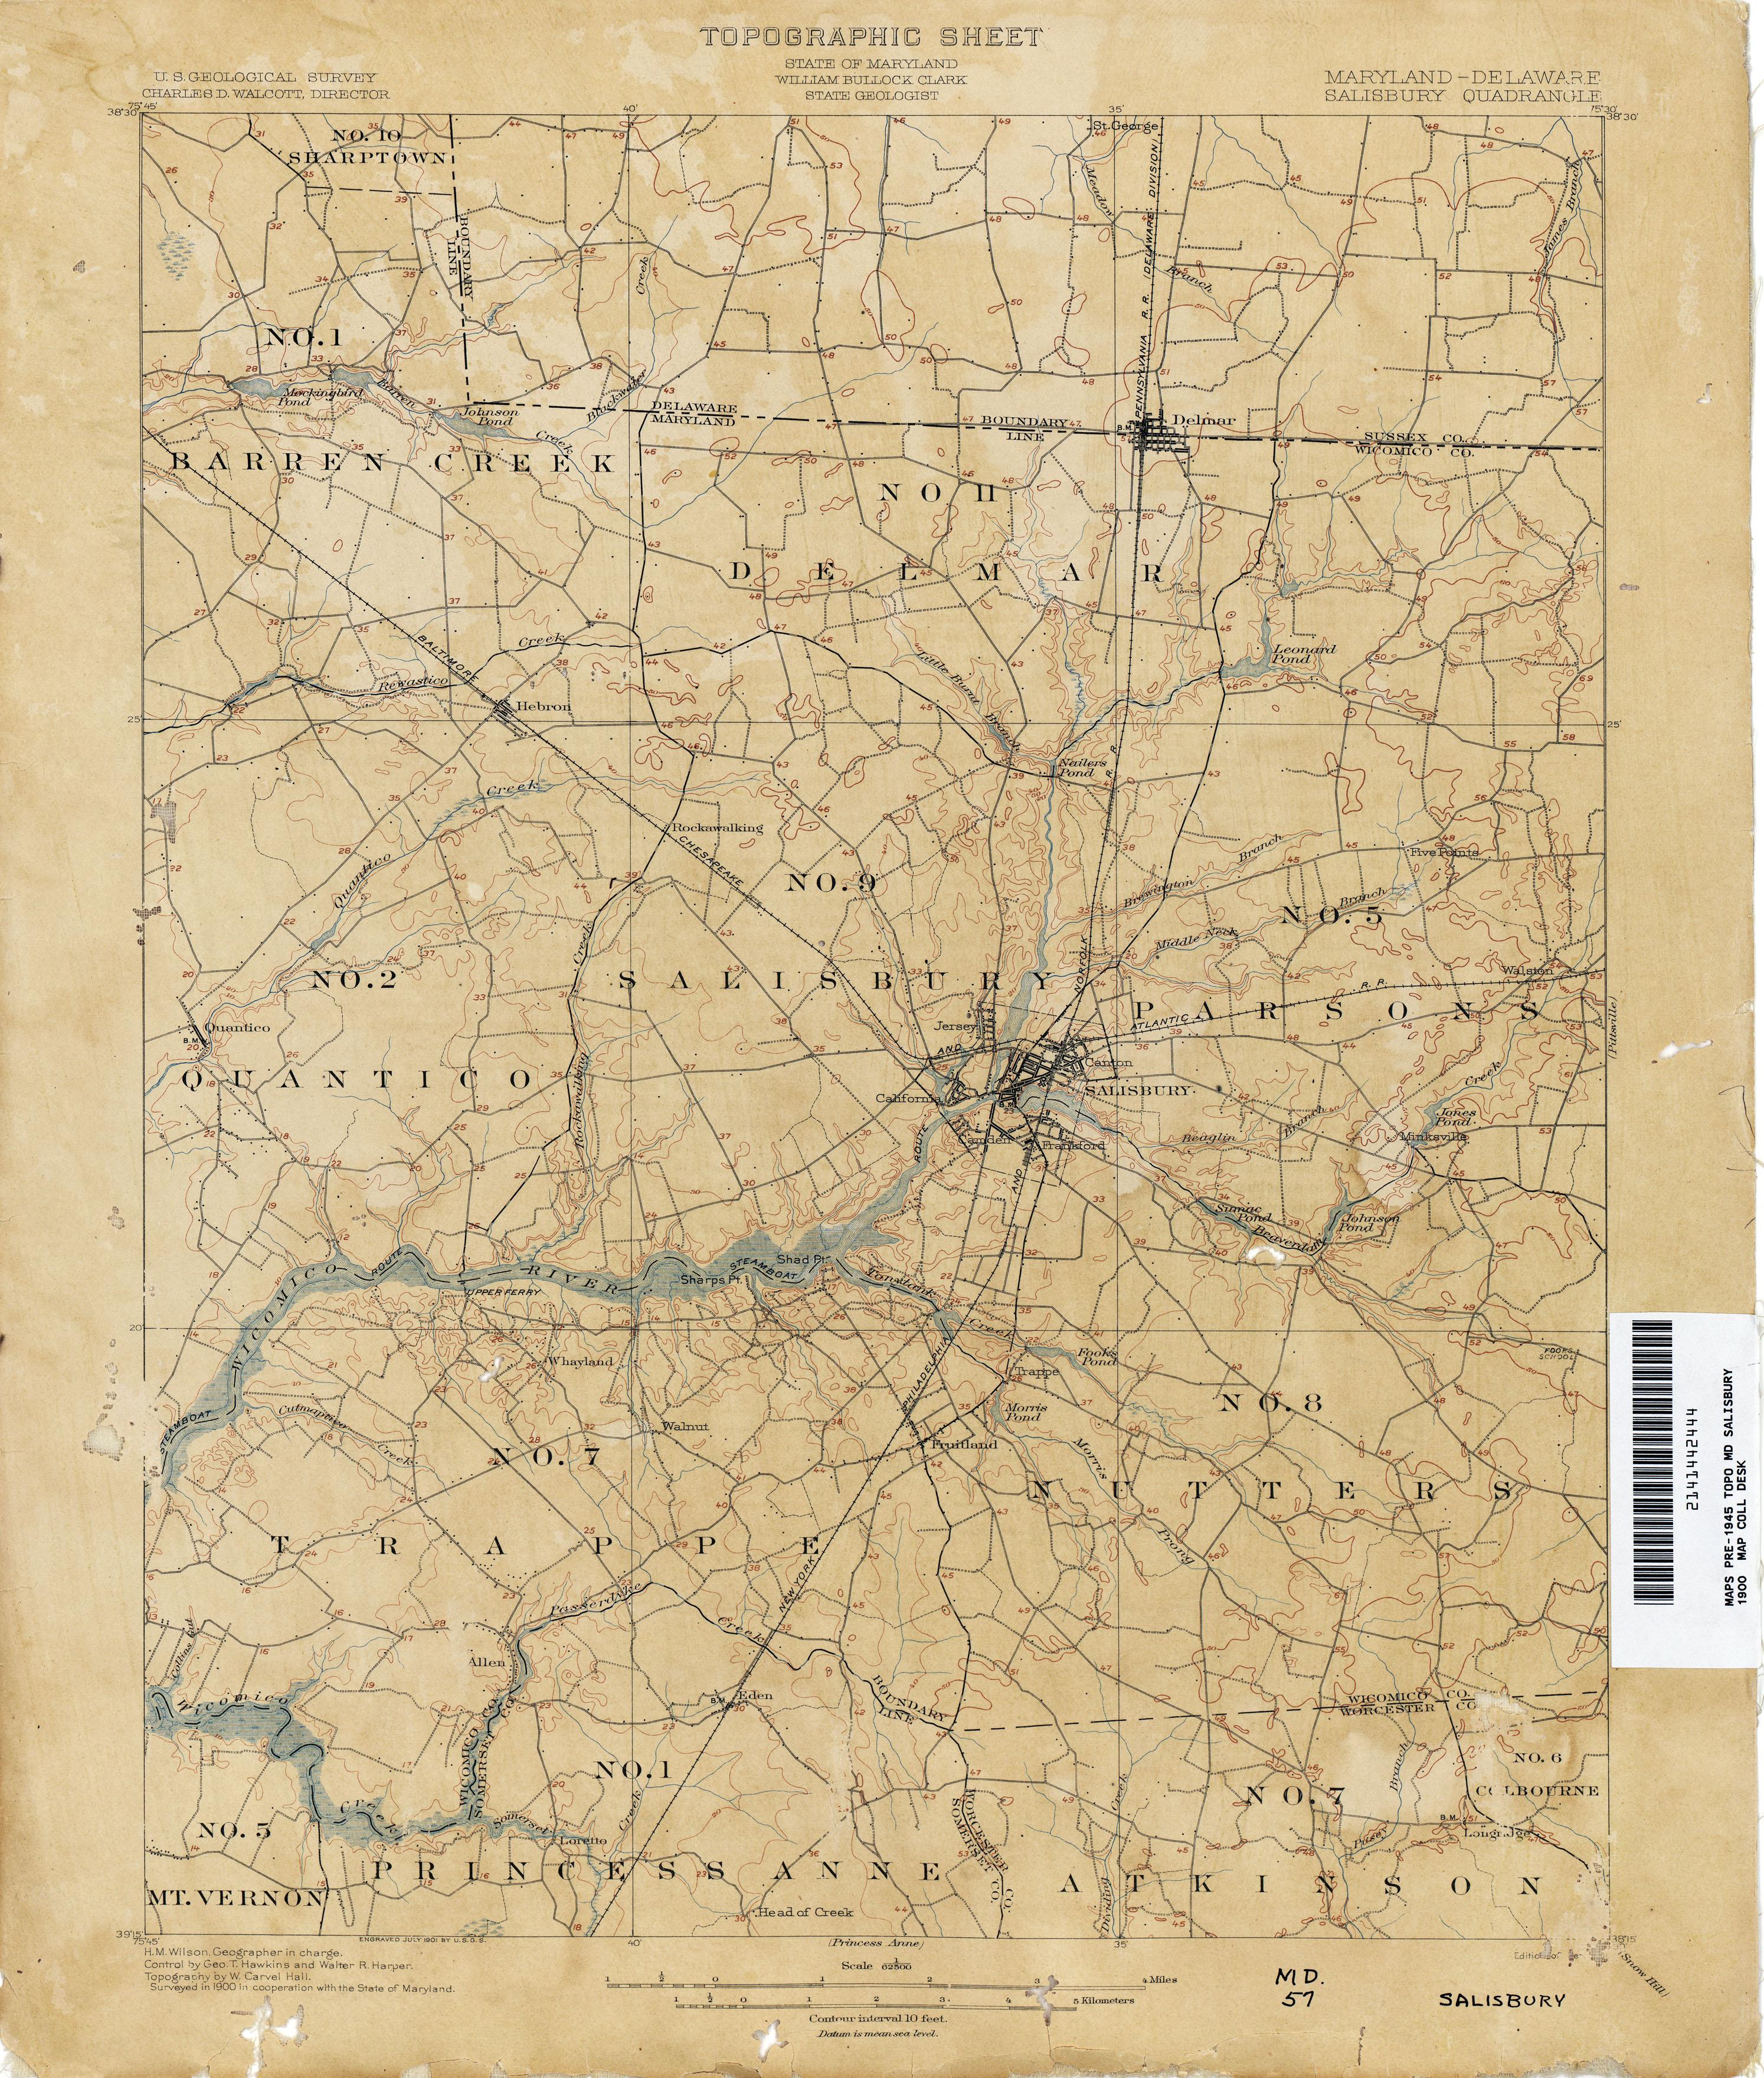 Salisbury Maryland Delaware 1900 162500 27MB